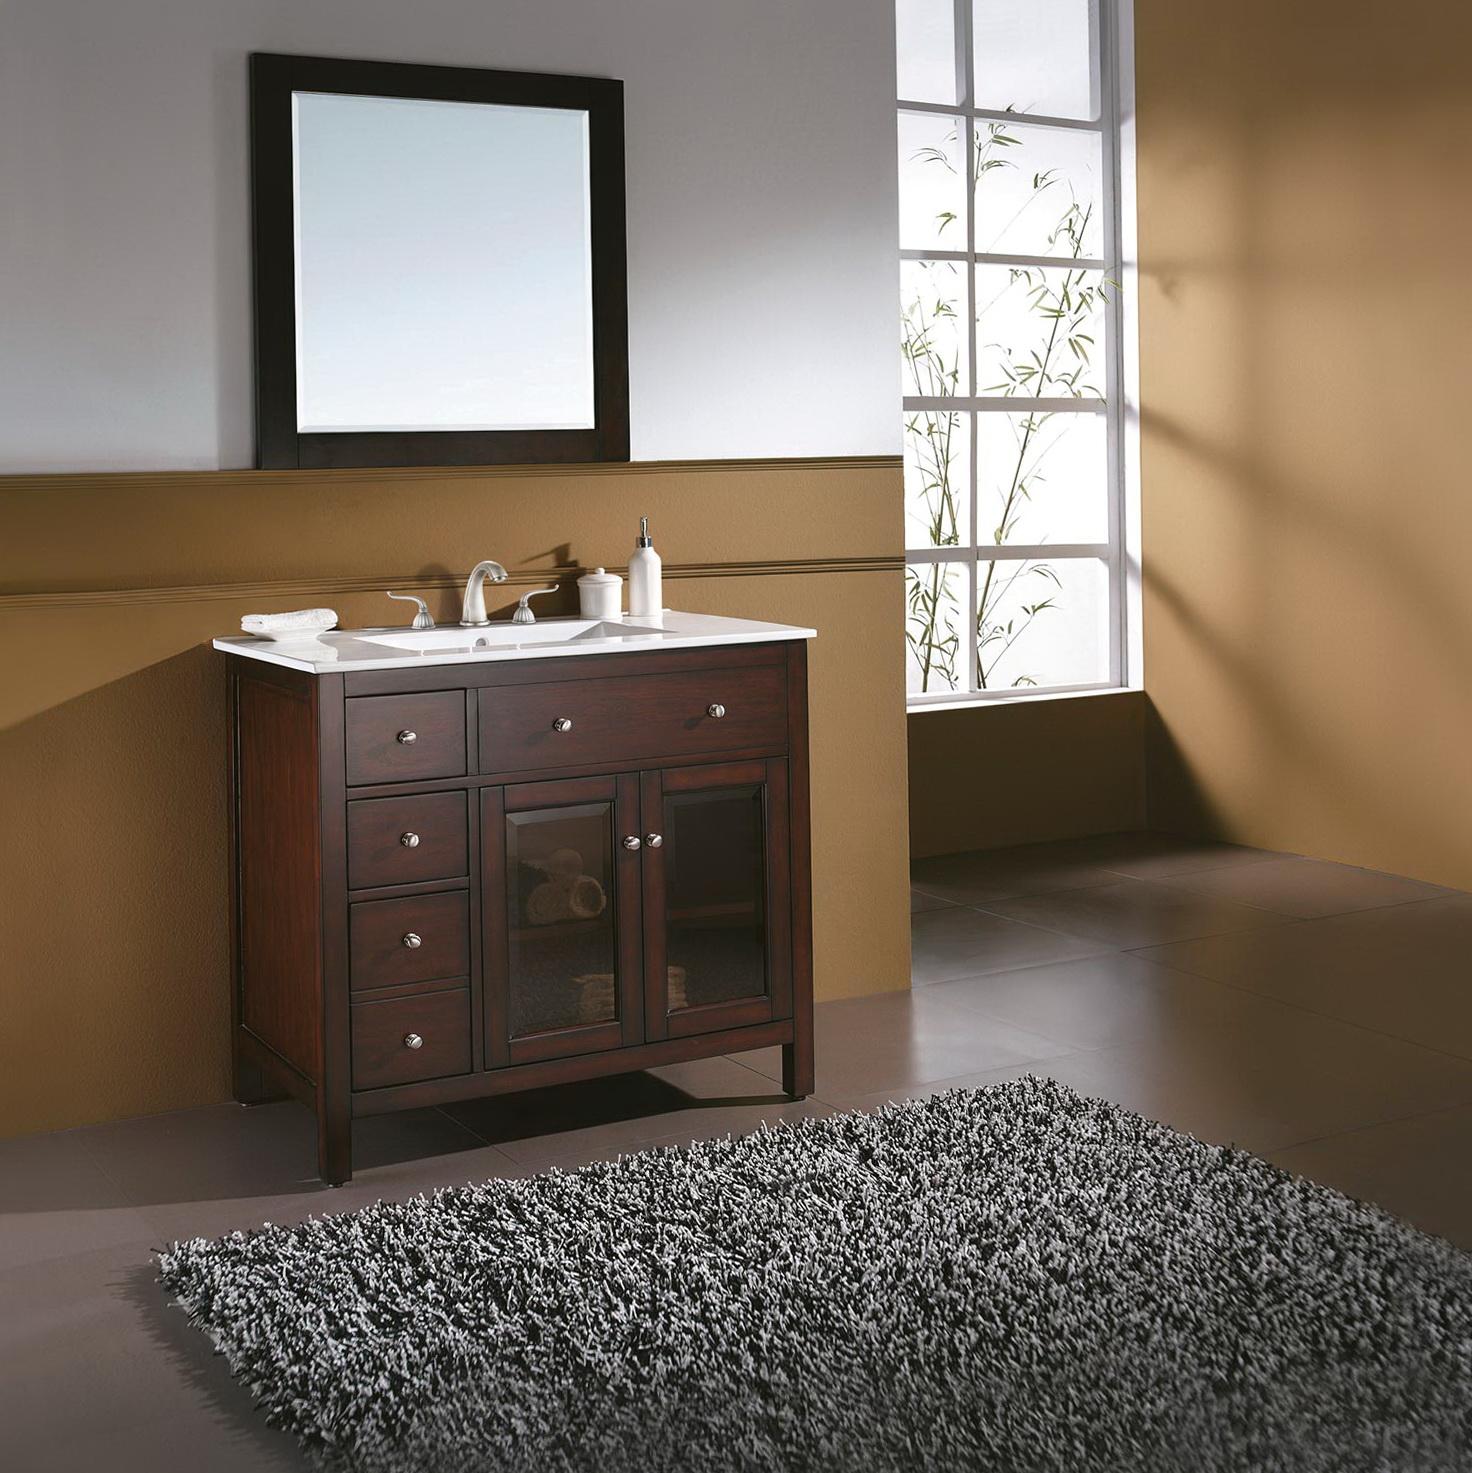 Bathroom vanity clearance sale home design ideas for Bathroom vanity sale clearance